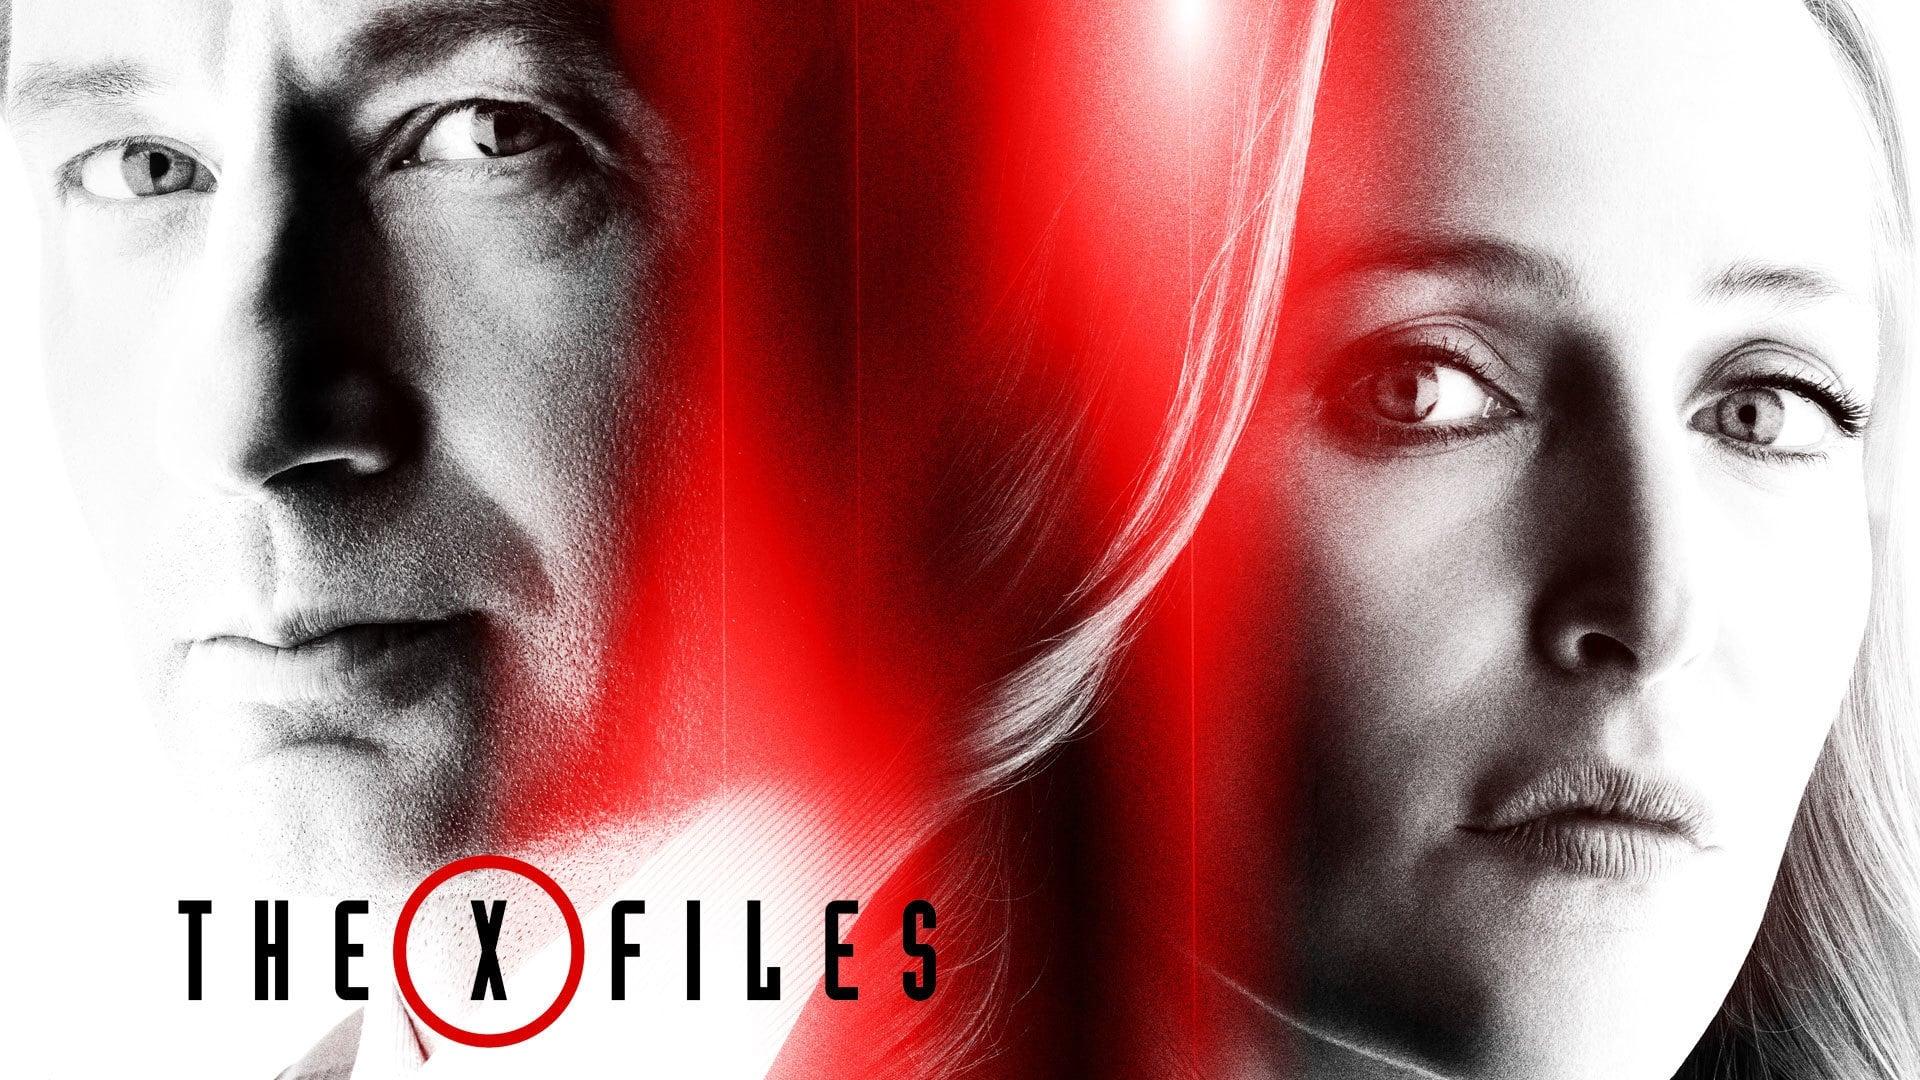 The X-Files - Season 3